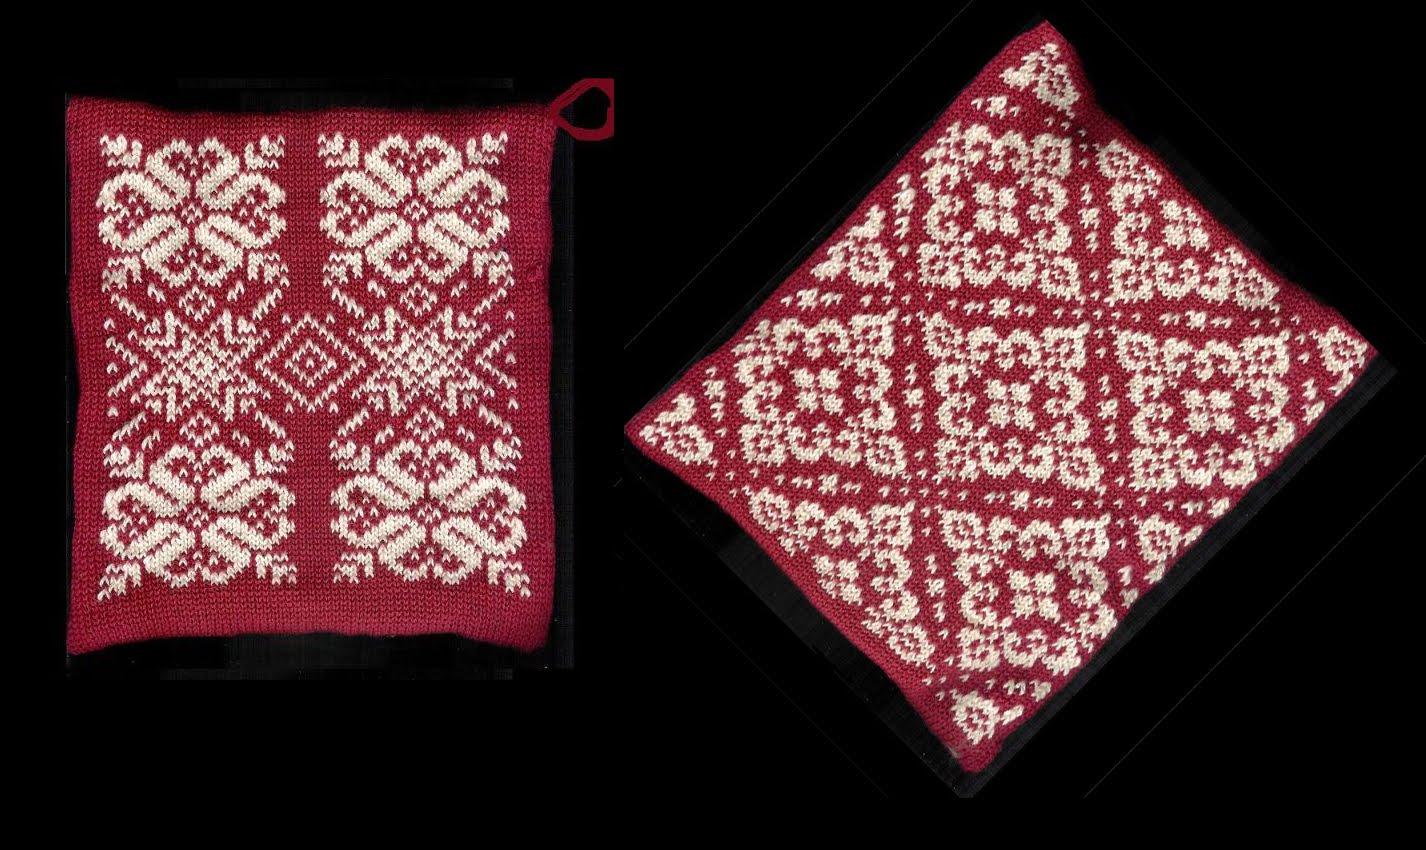 Norwegian Knitting Patterns | Patterns Gallery